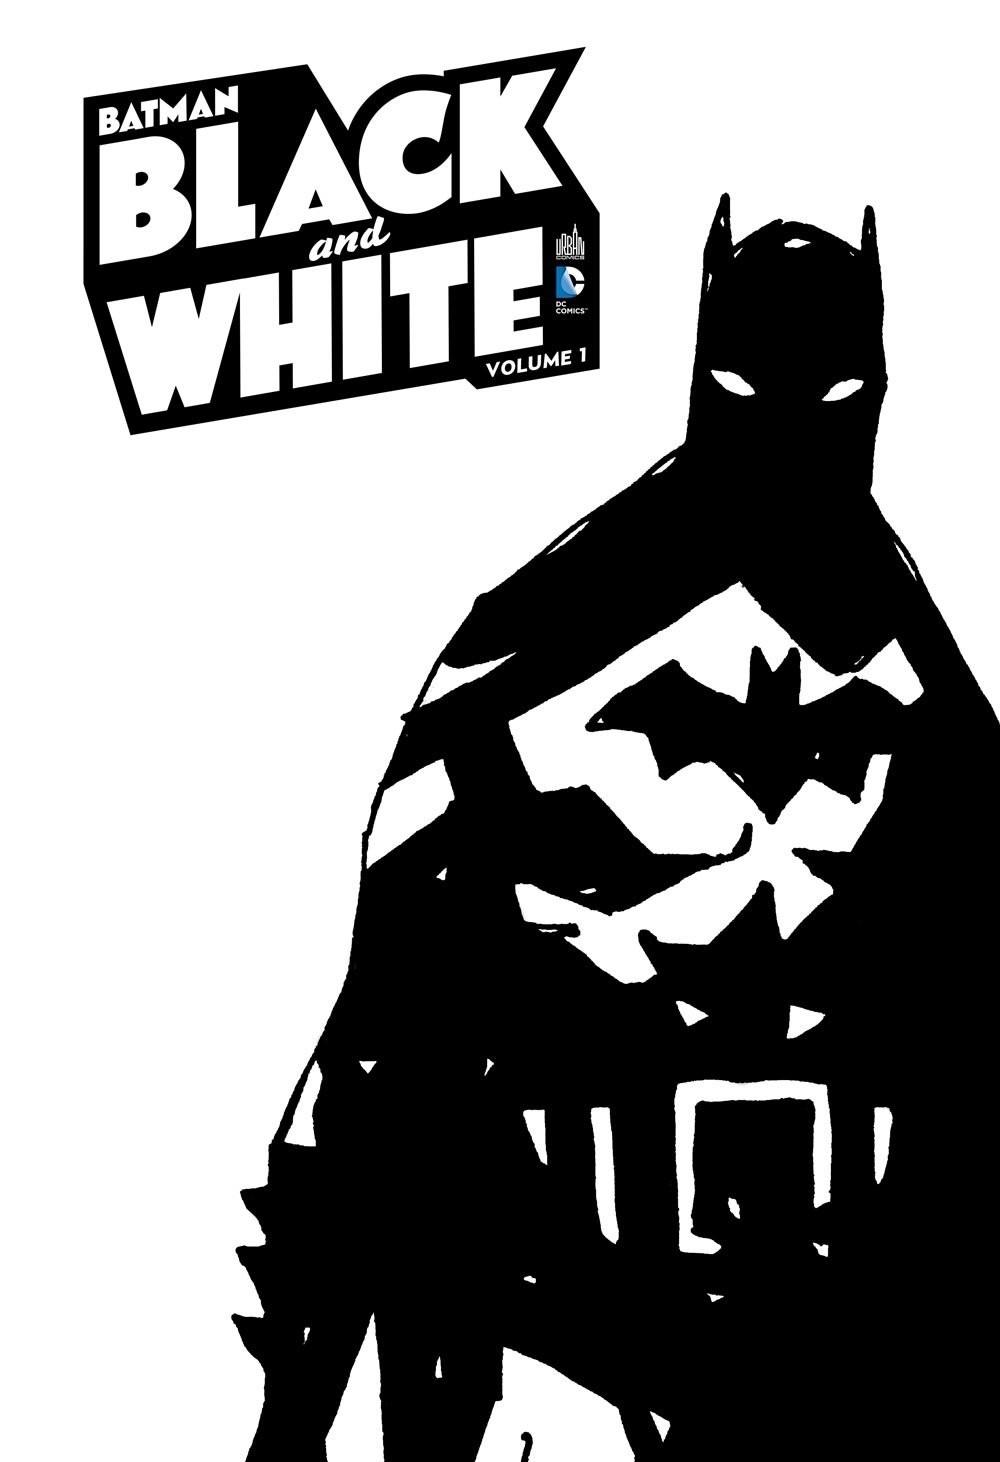 Batman : Dark Knight III tome 1 (VF) cartonné